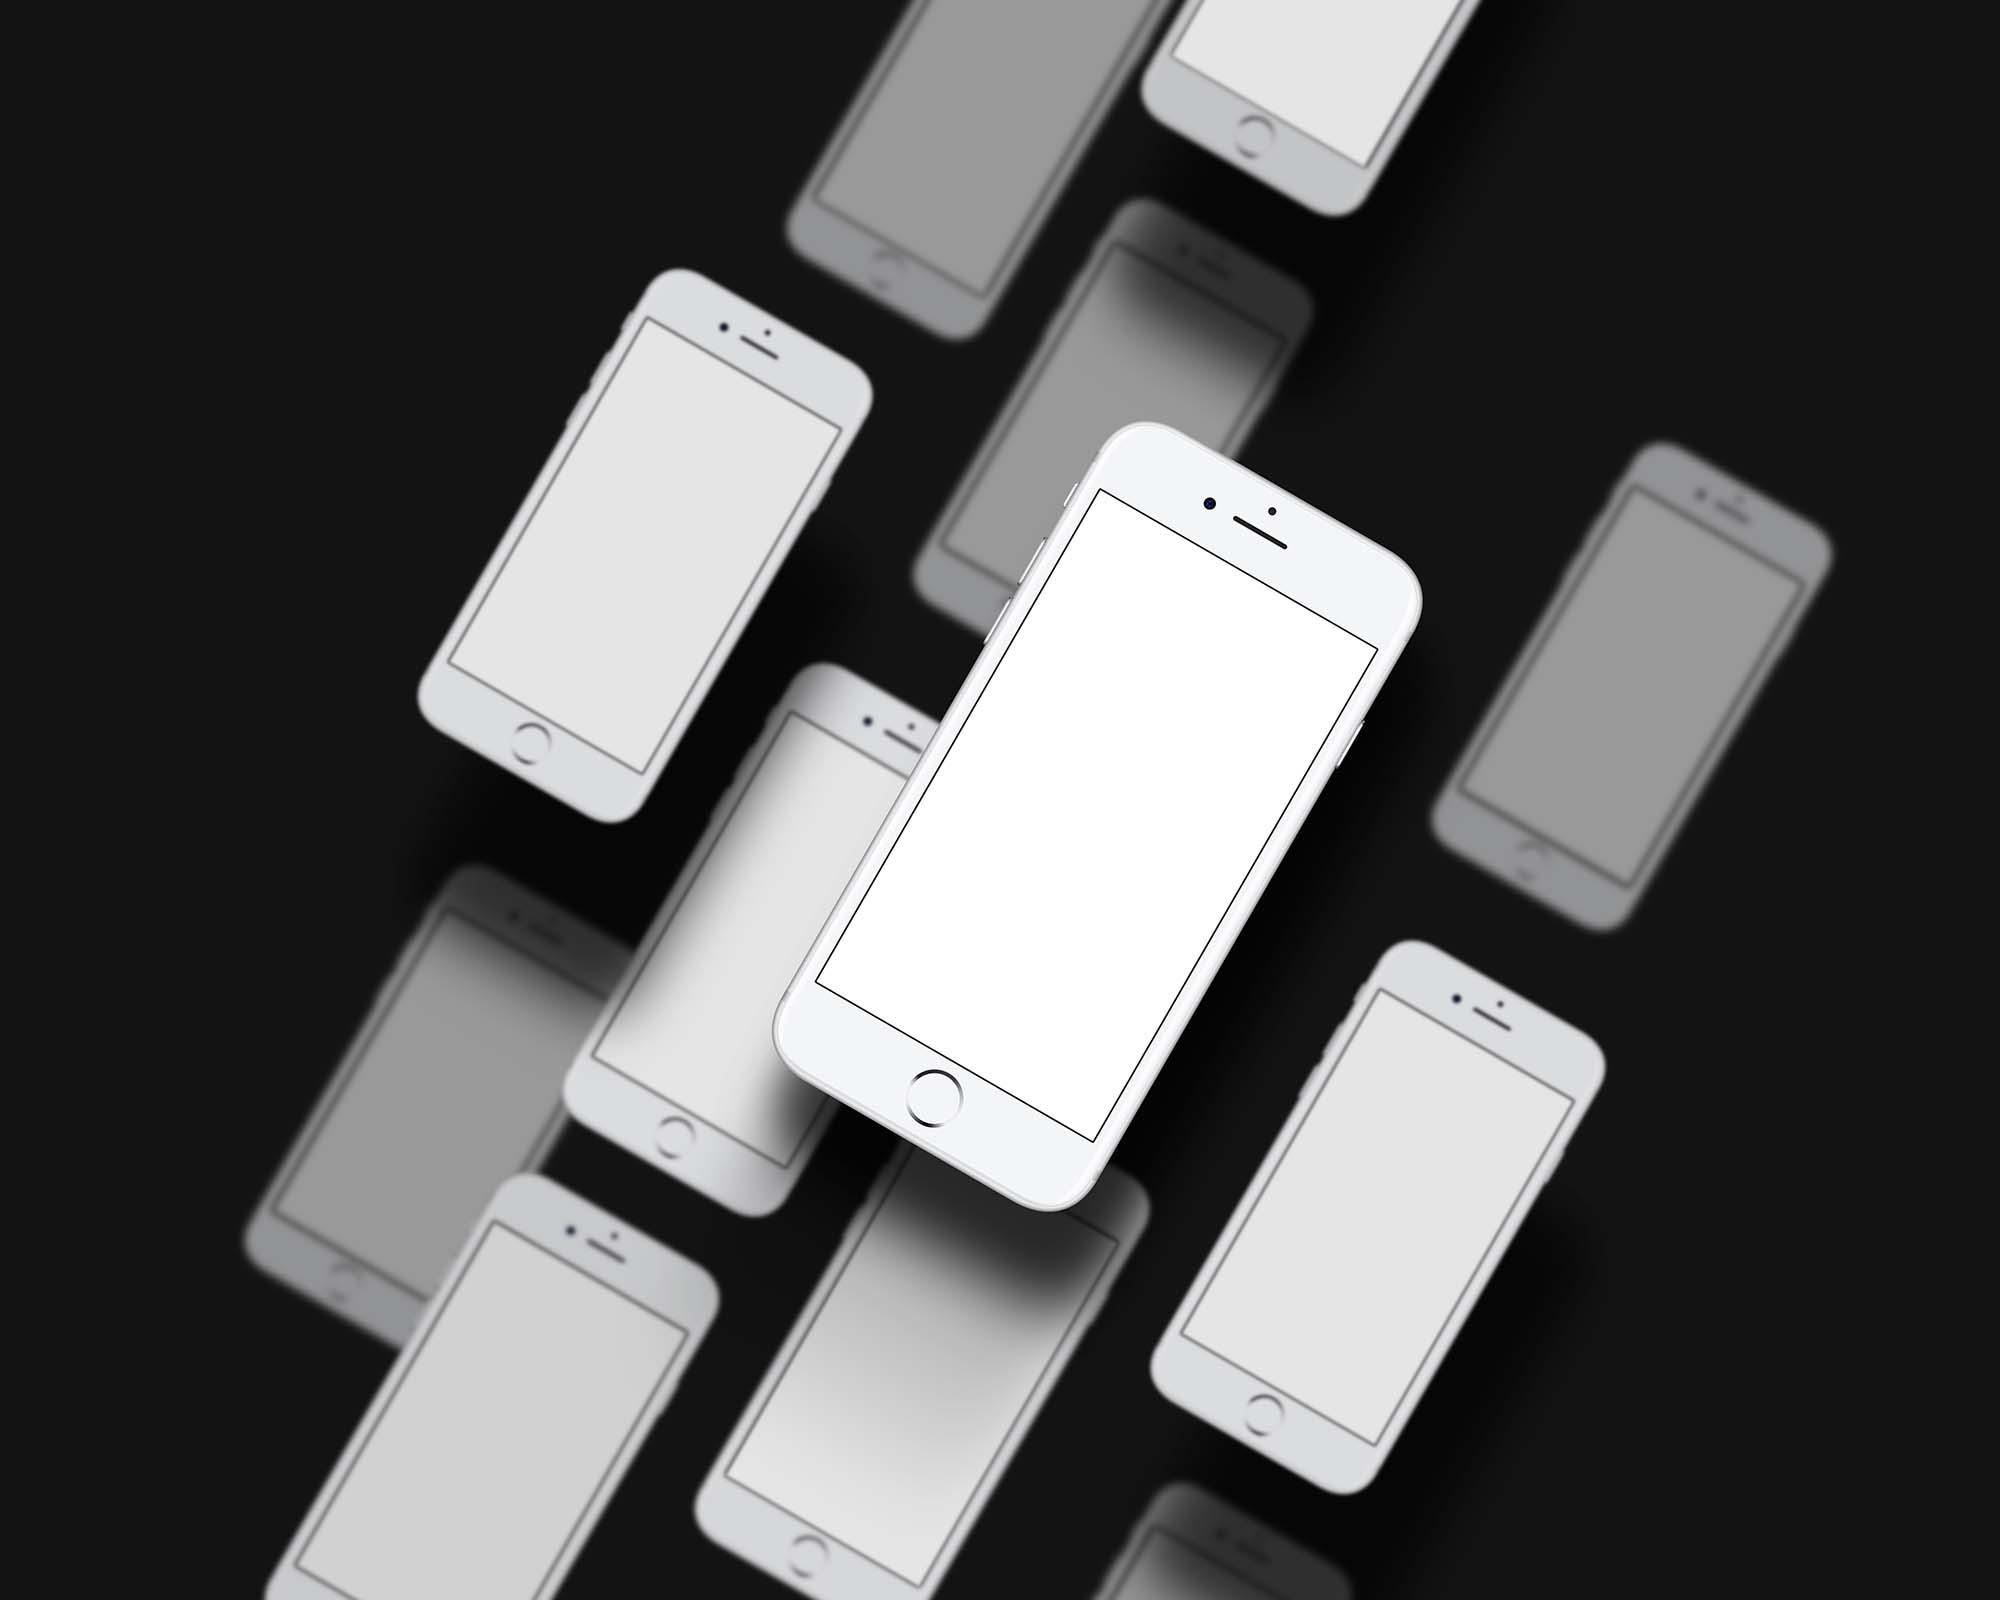 Multiple App Screen Showcase Mockup 2